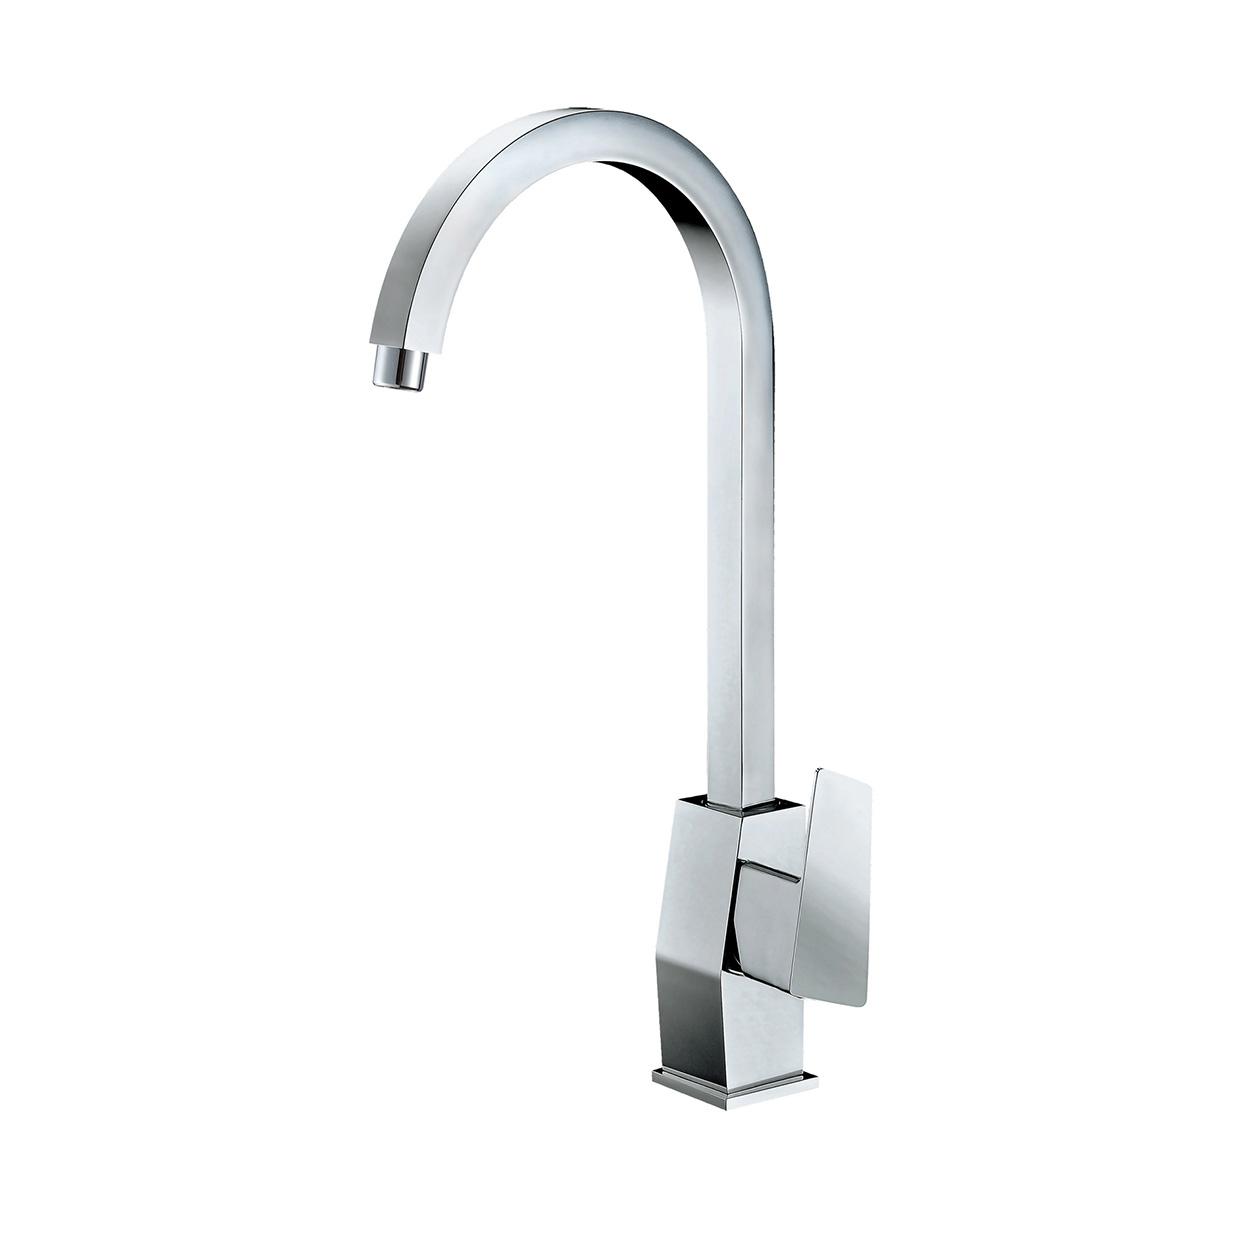 Bath4all Alfi Brand Ab3470 Pc Polished Chrome Gooseneck Single Hole Bathroom Faucet